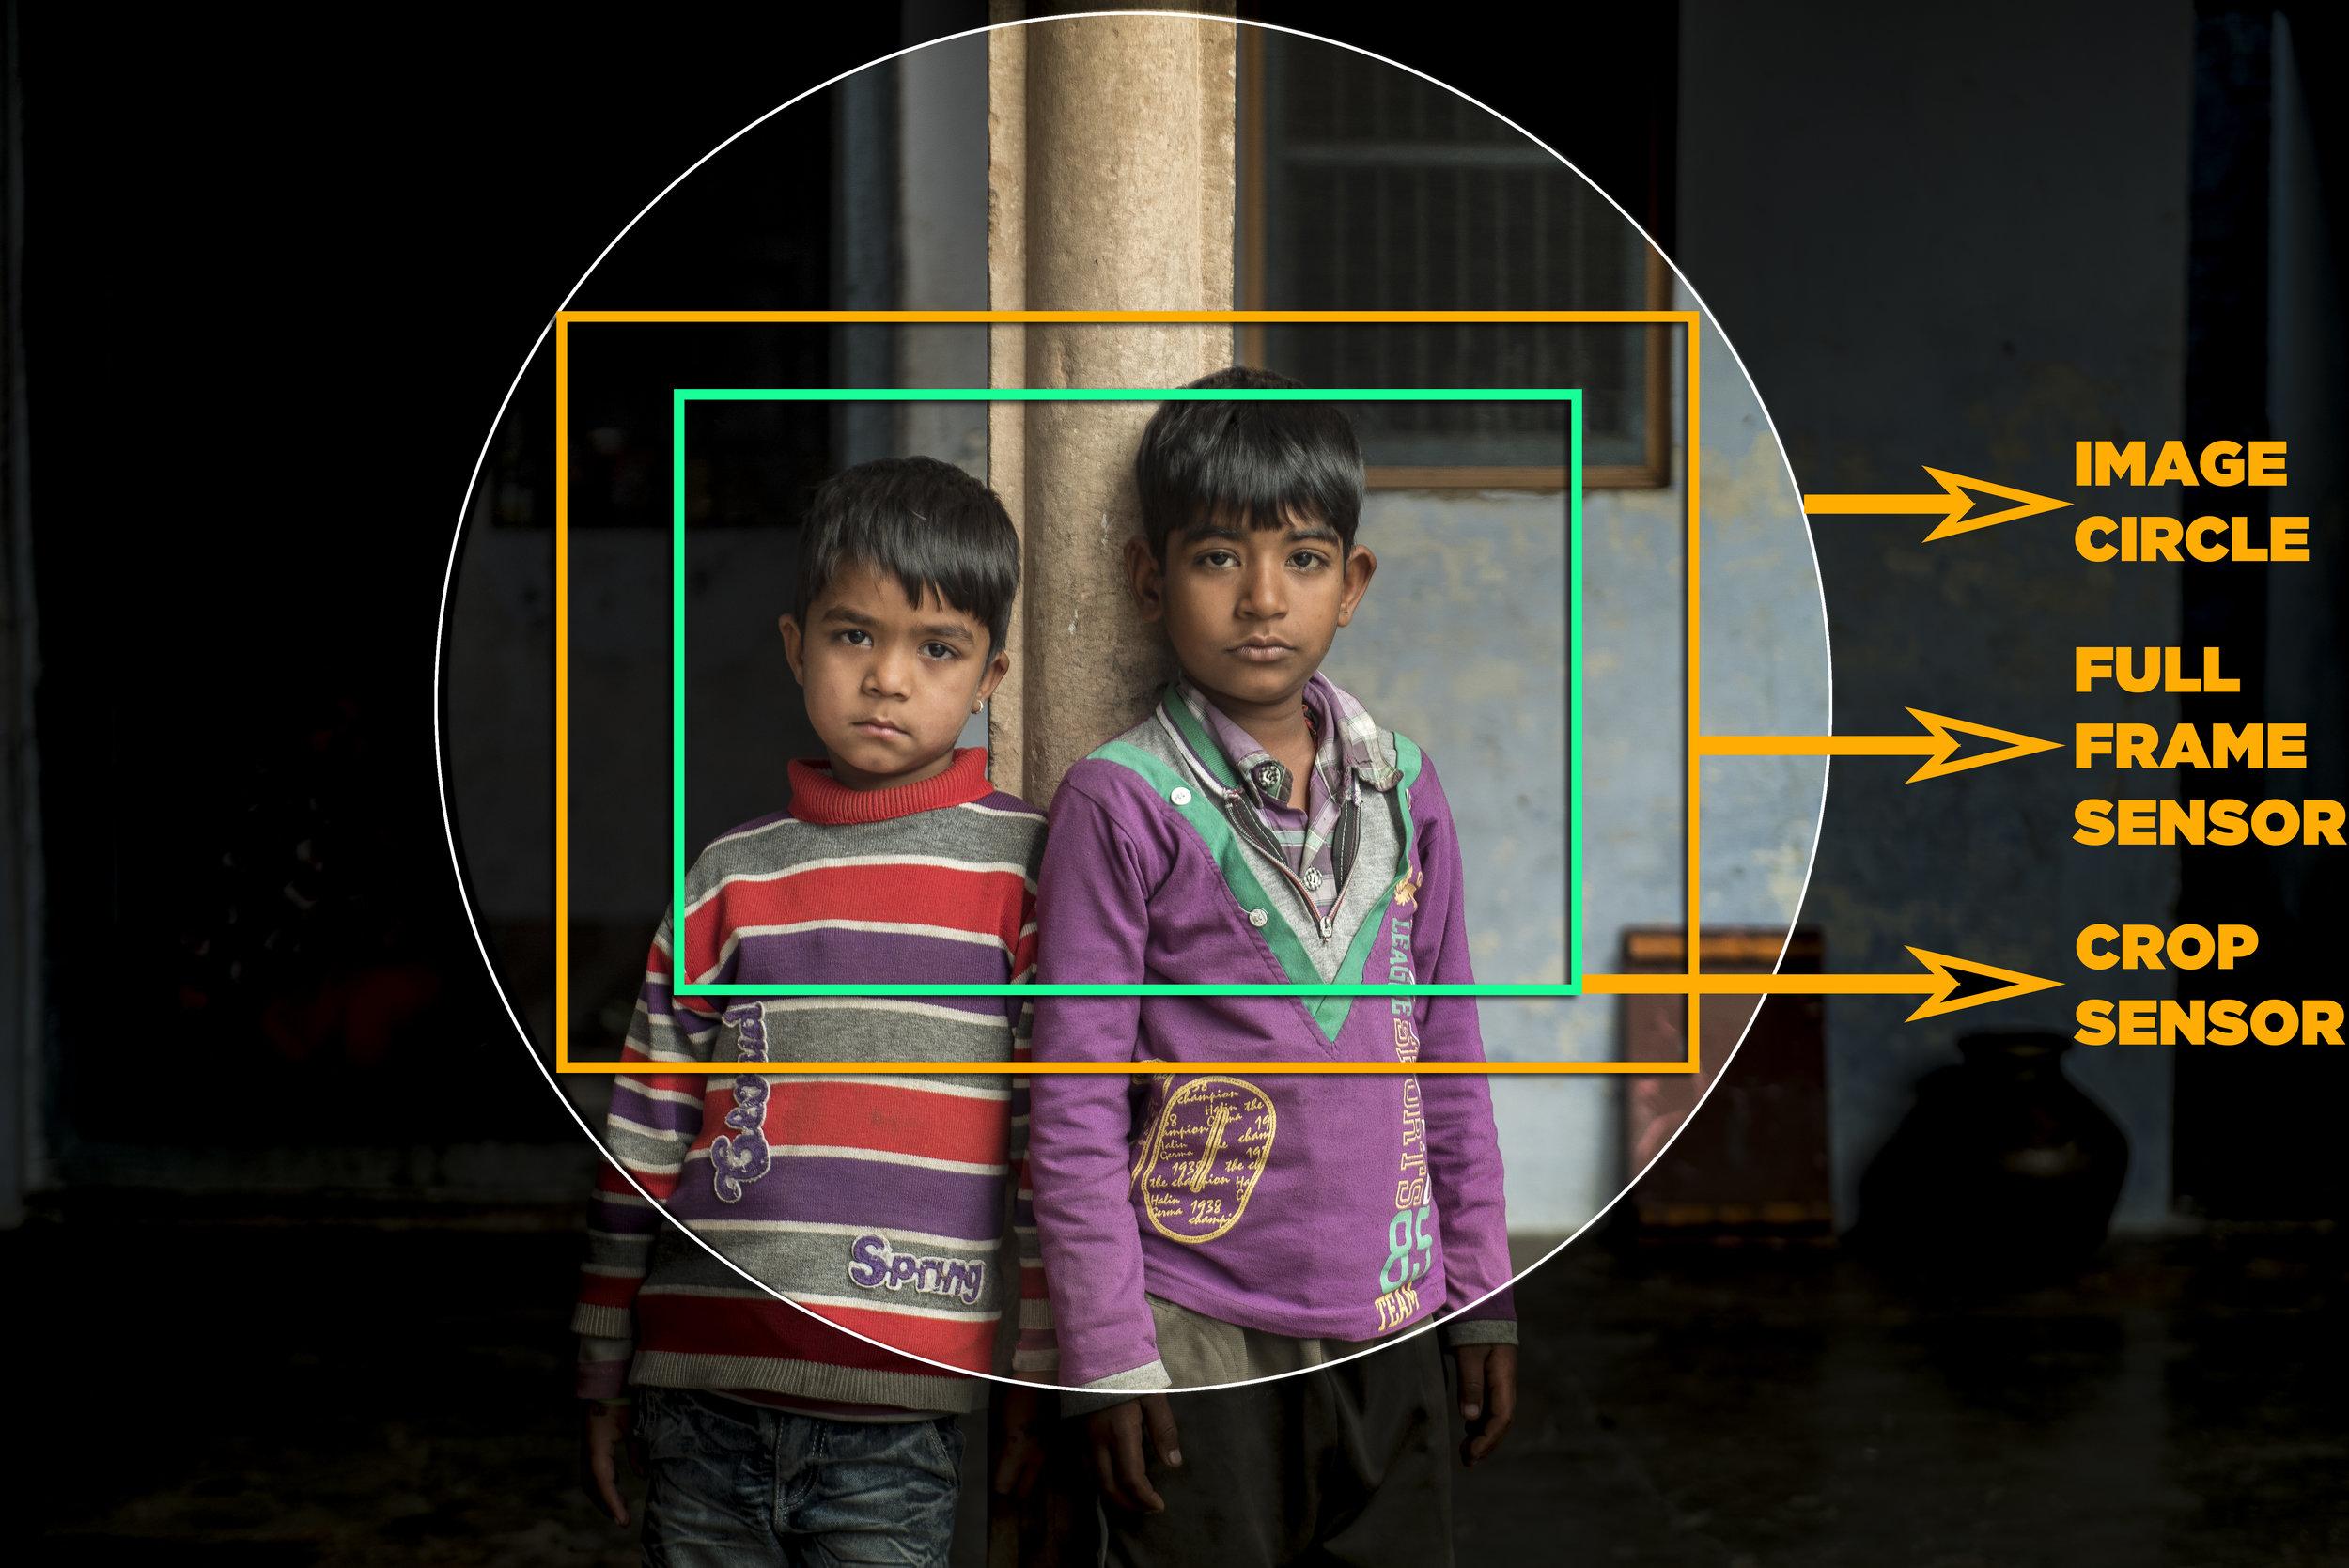 GMAX STUDIOS_IMAGE CIRCLE_FIELD OF VIEW_APSC_FULL FRAME